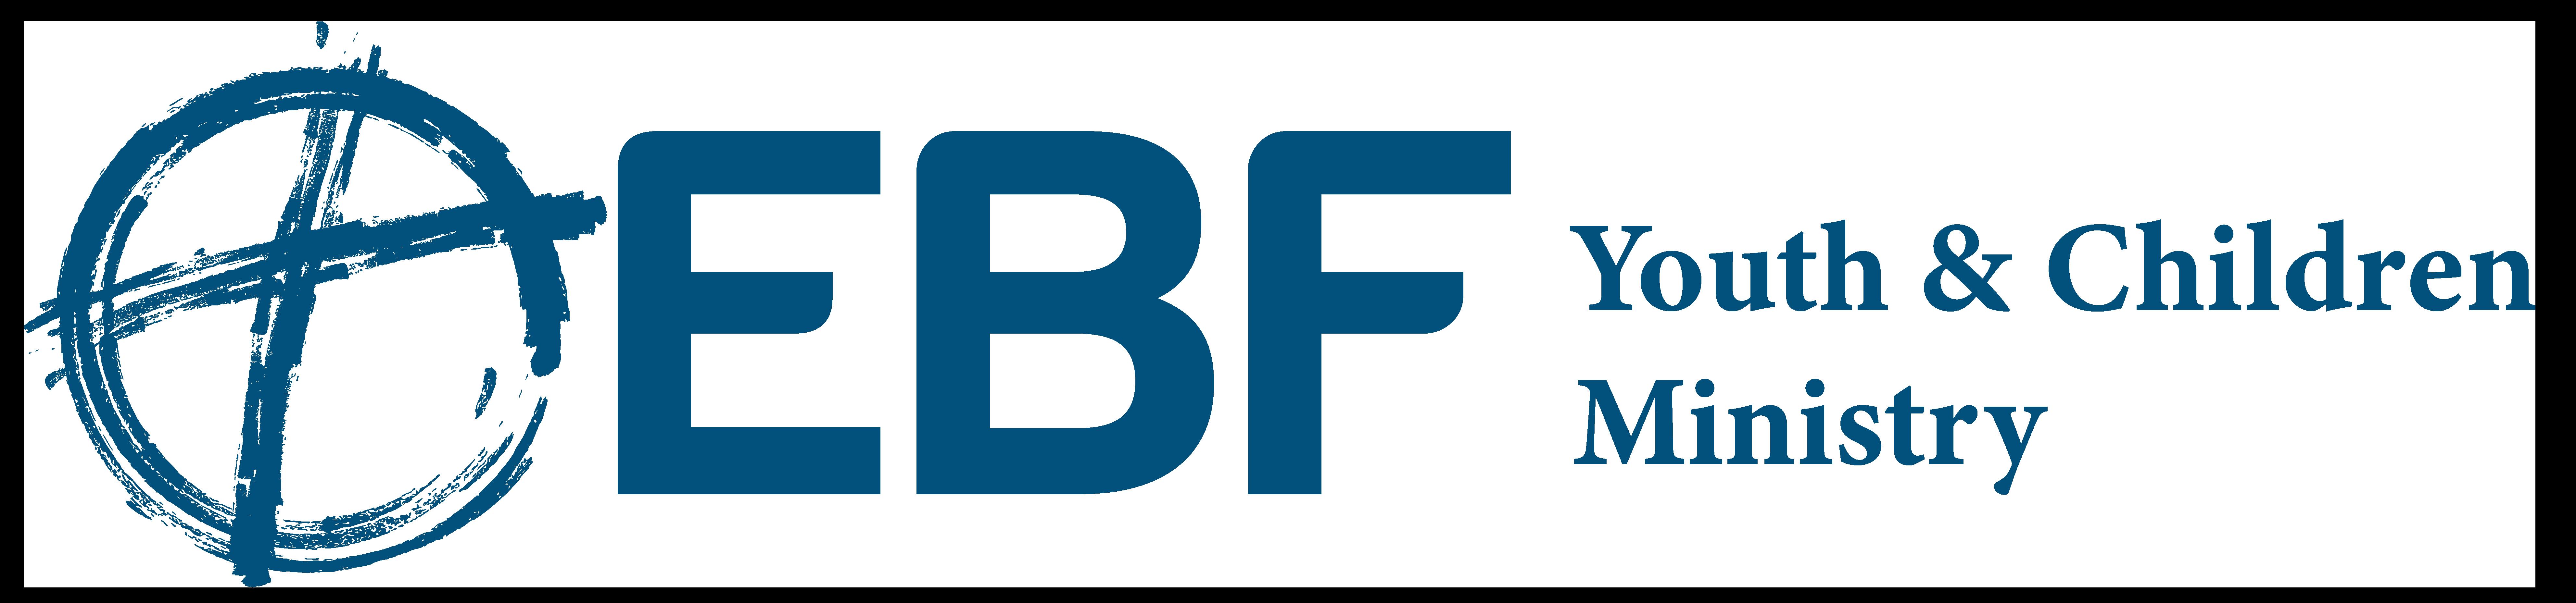 EBFYC.ORG